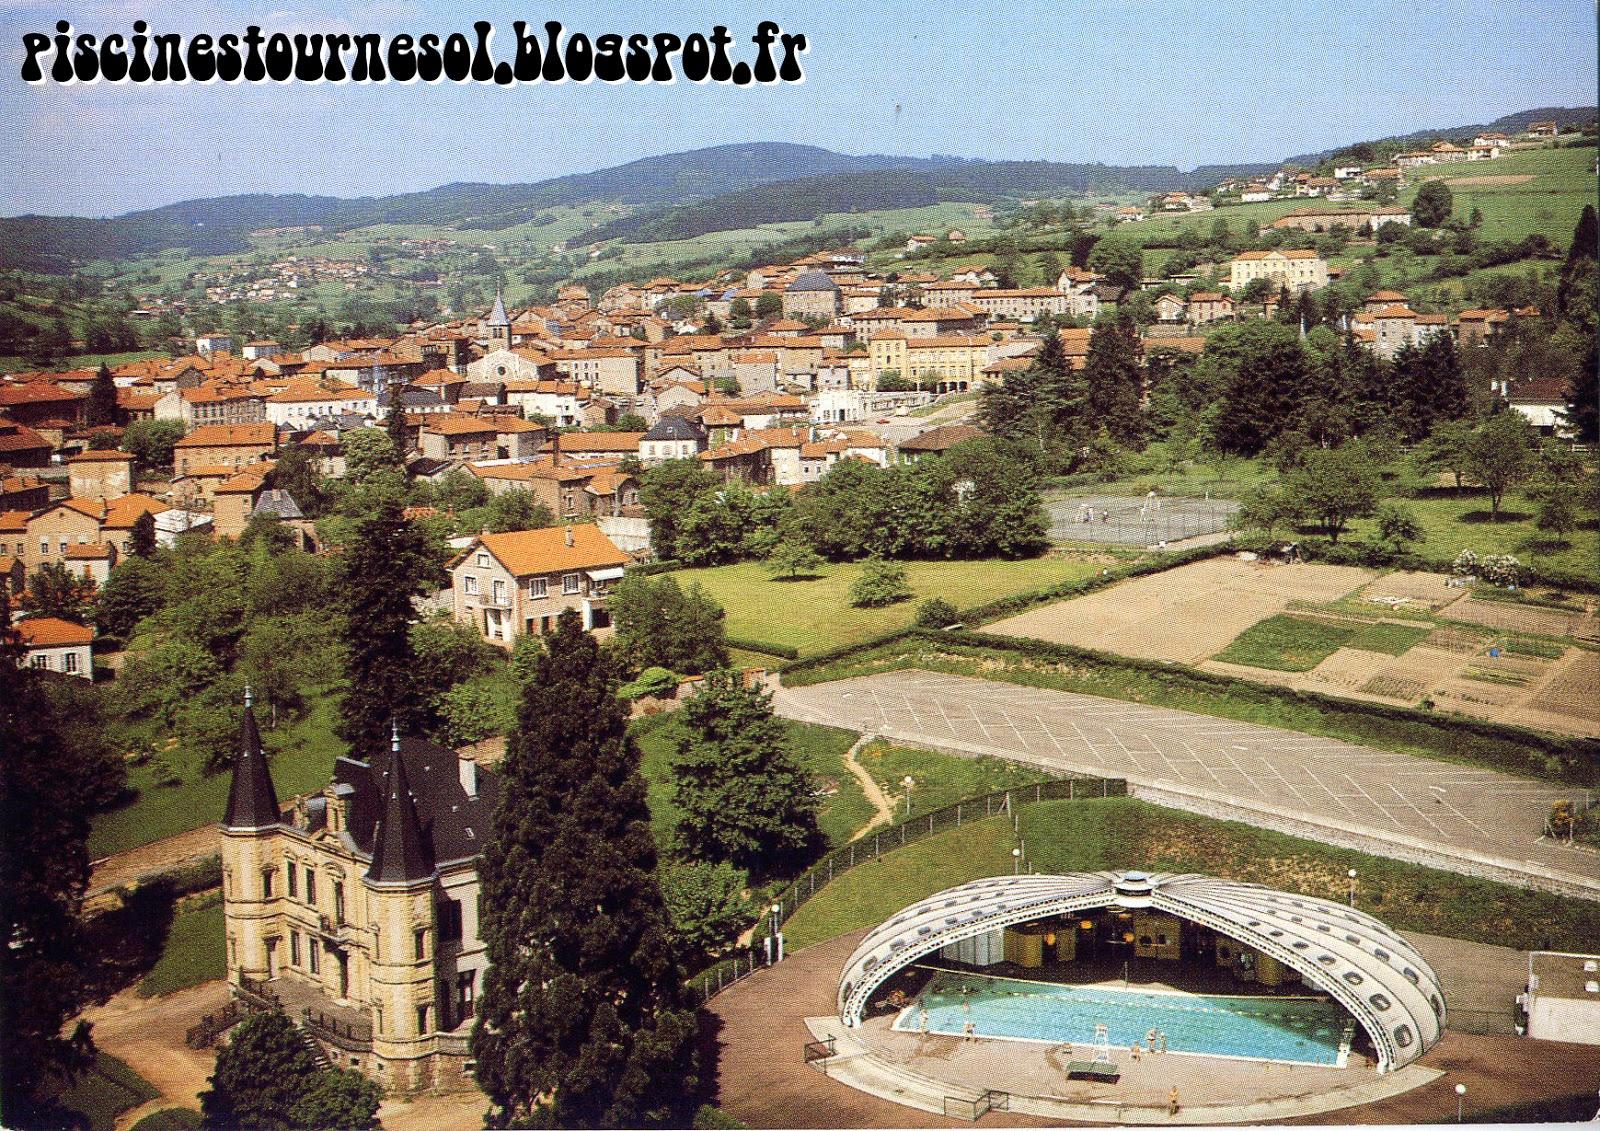 Piscines Tournesol PISCINE TOURNESOL COURS LA VILLE